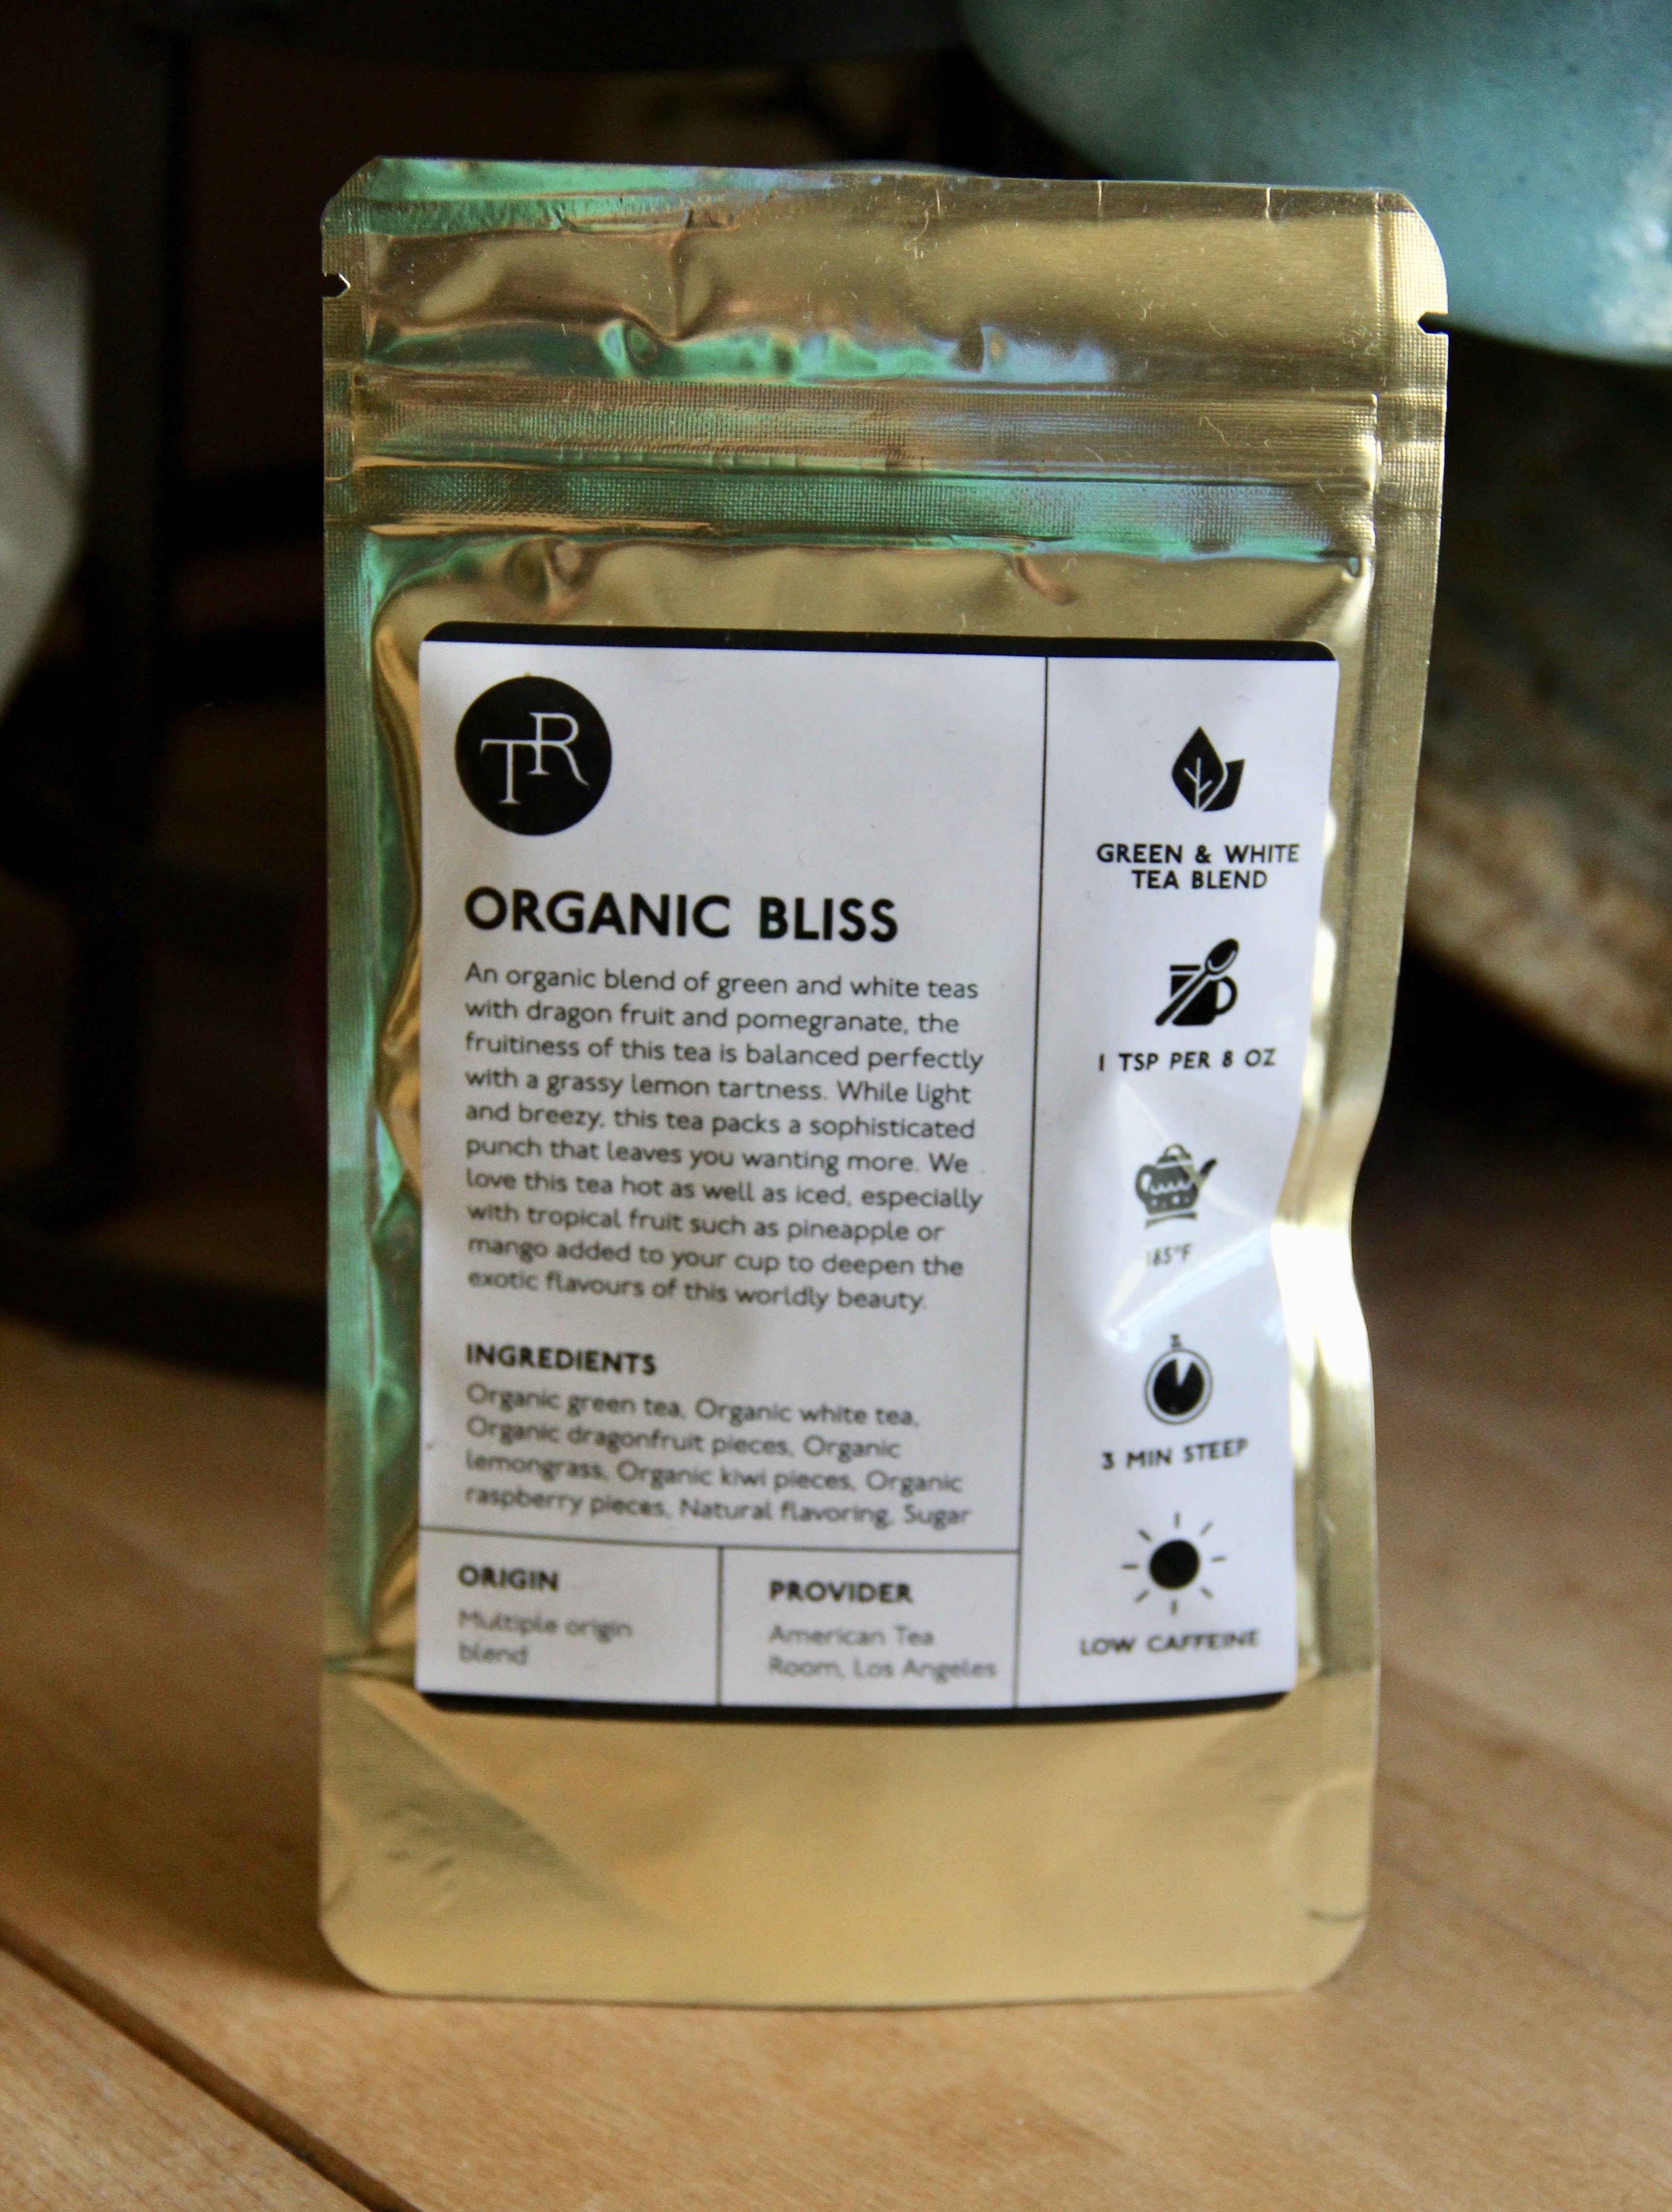 TR American Tea Room Organic Bliss